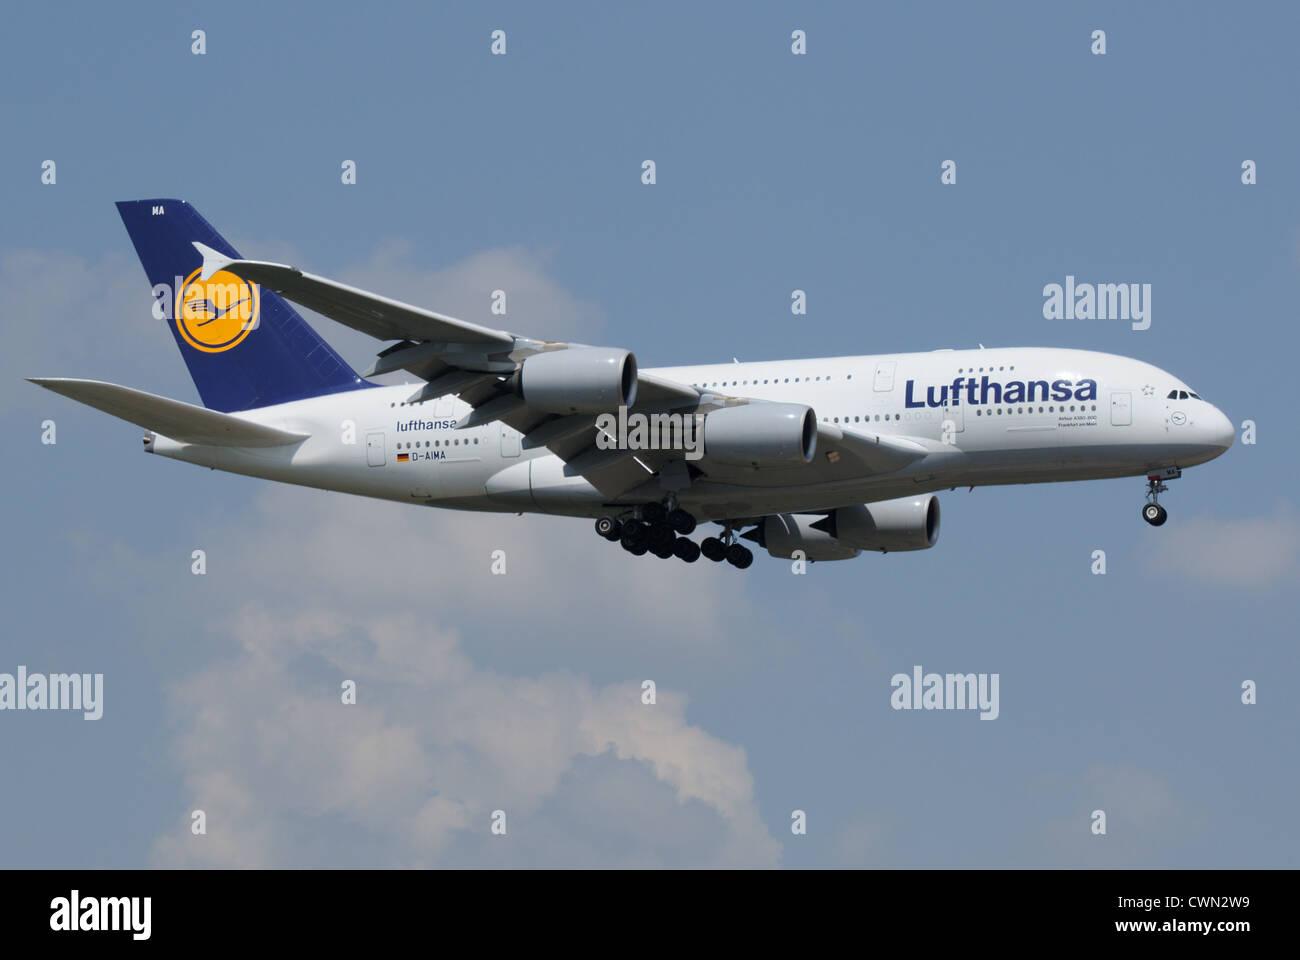 Lufthansa Airbus A380 - Stock Image